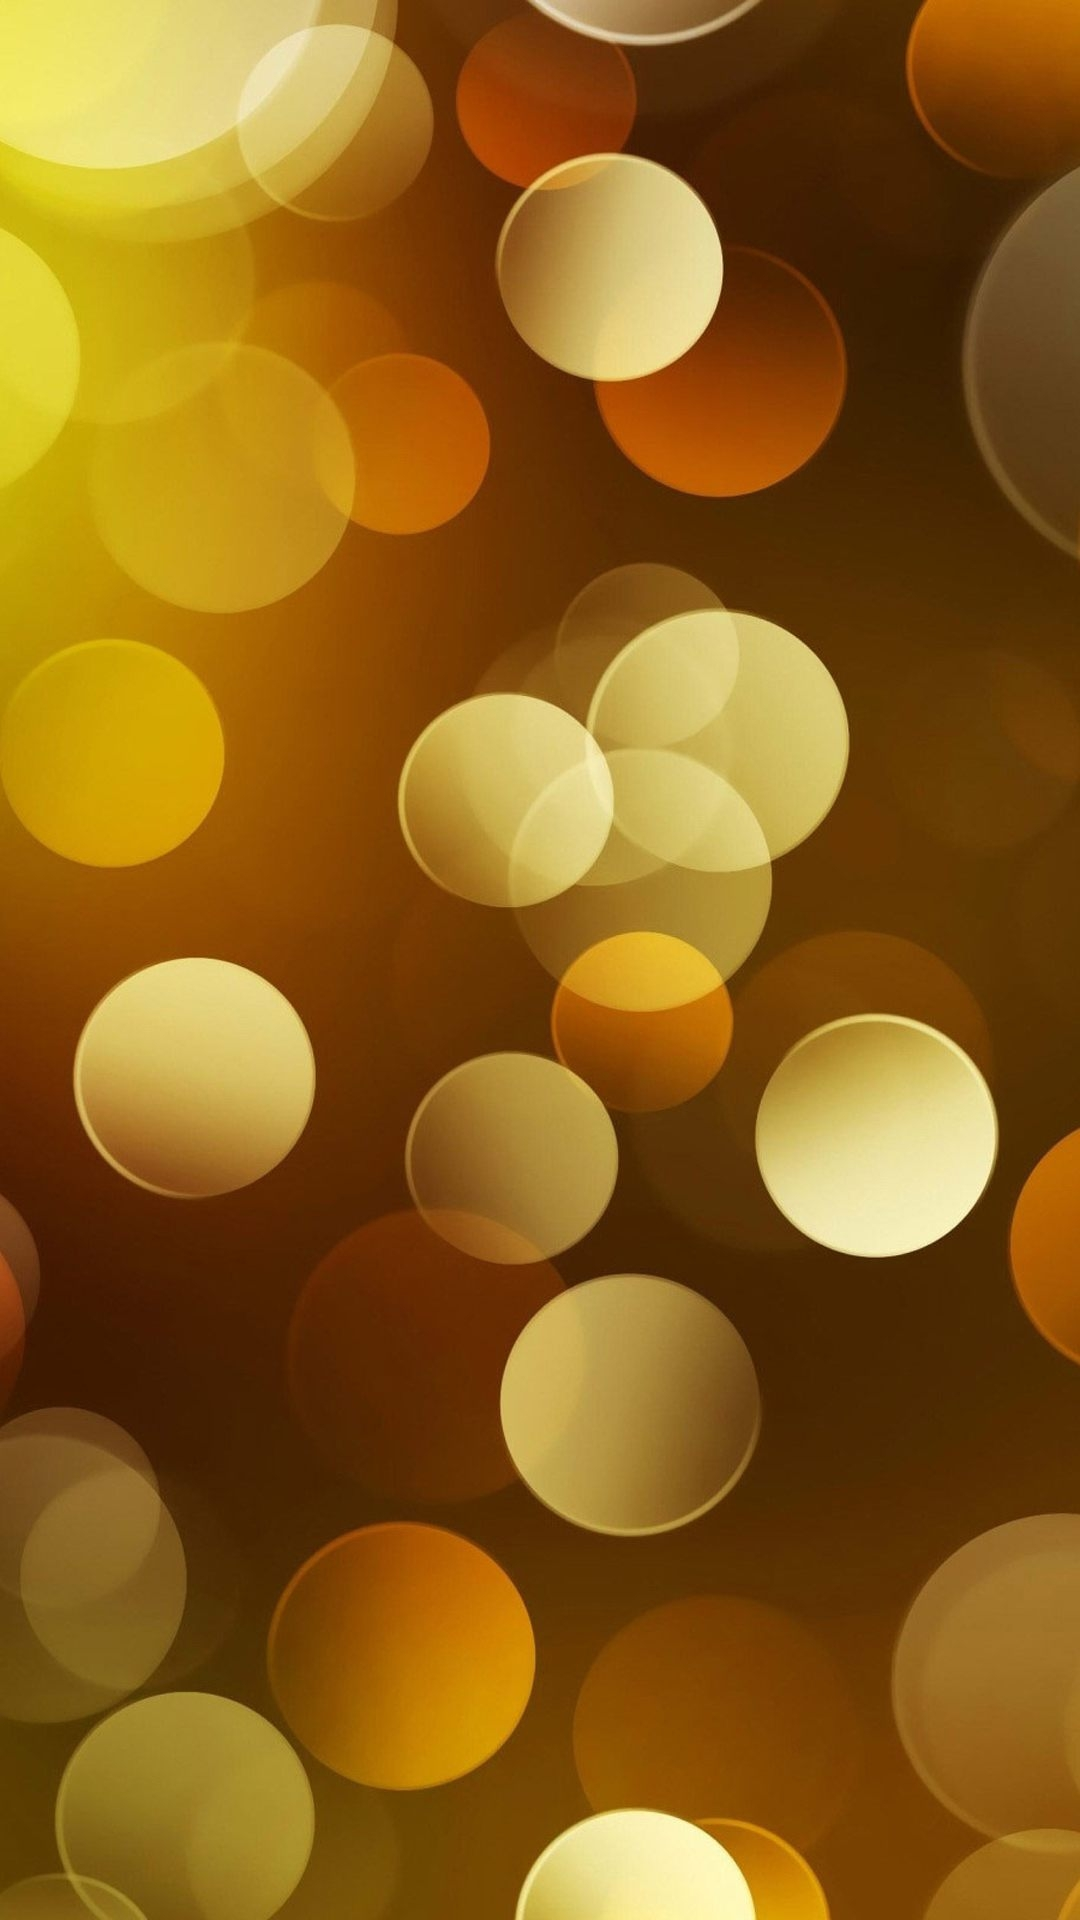 Gold Circle Pattern Iphone Wallpaper